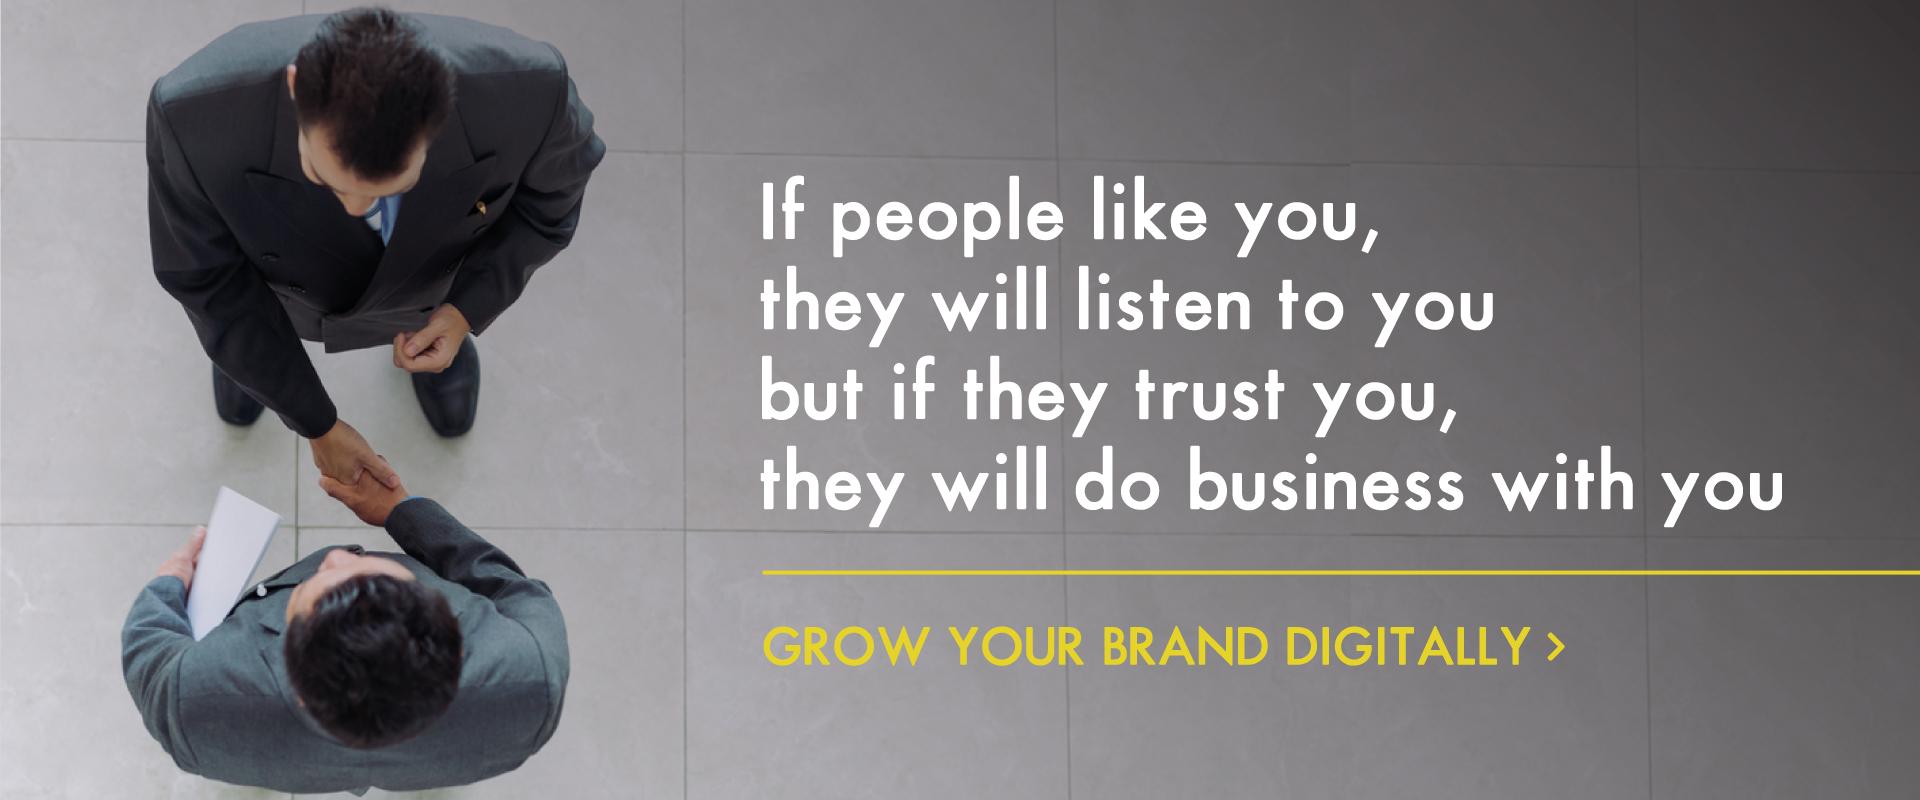 Leadwalnut-grow-your-brand-digitally-banner